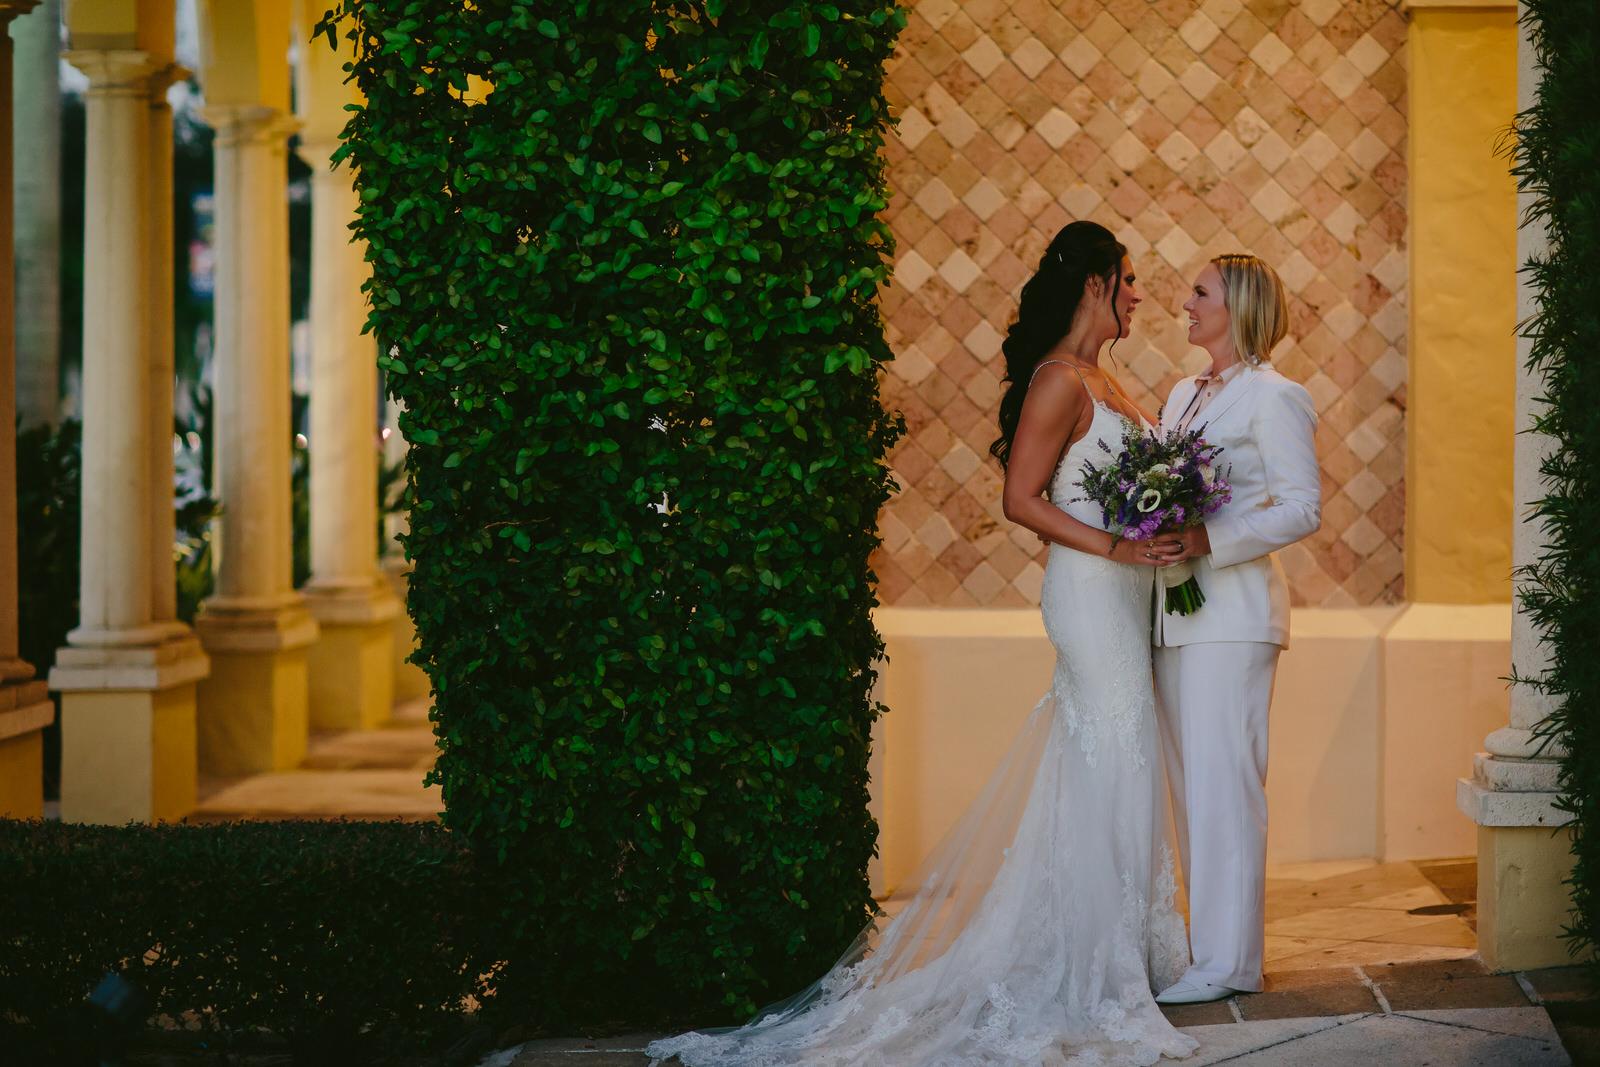 brides_in_love_lesbian_love_story_tiny_house_photo_lgbtq_wedding_photographer.jpg